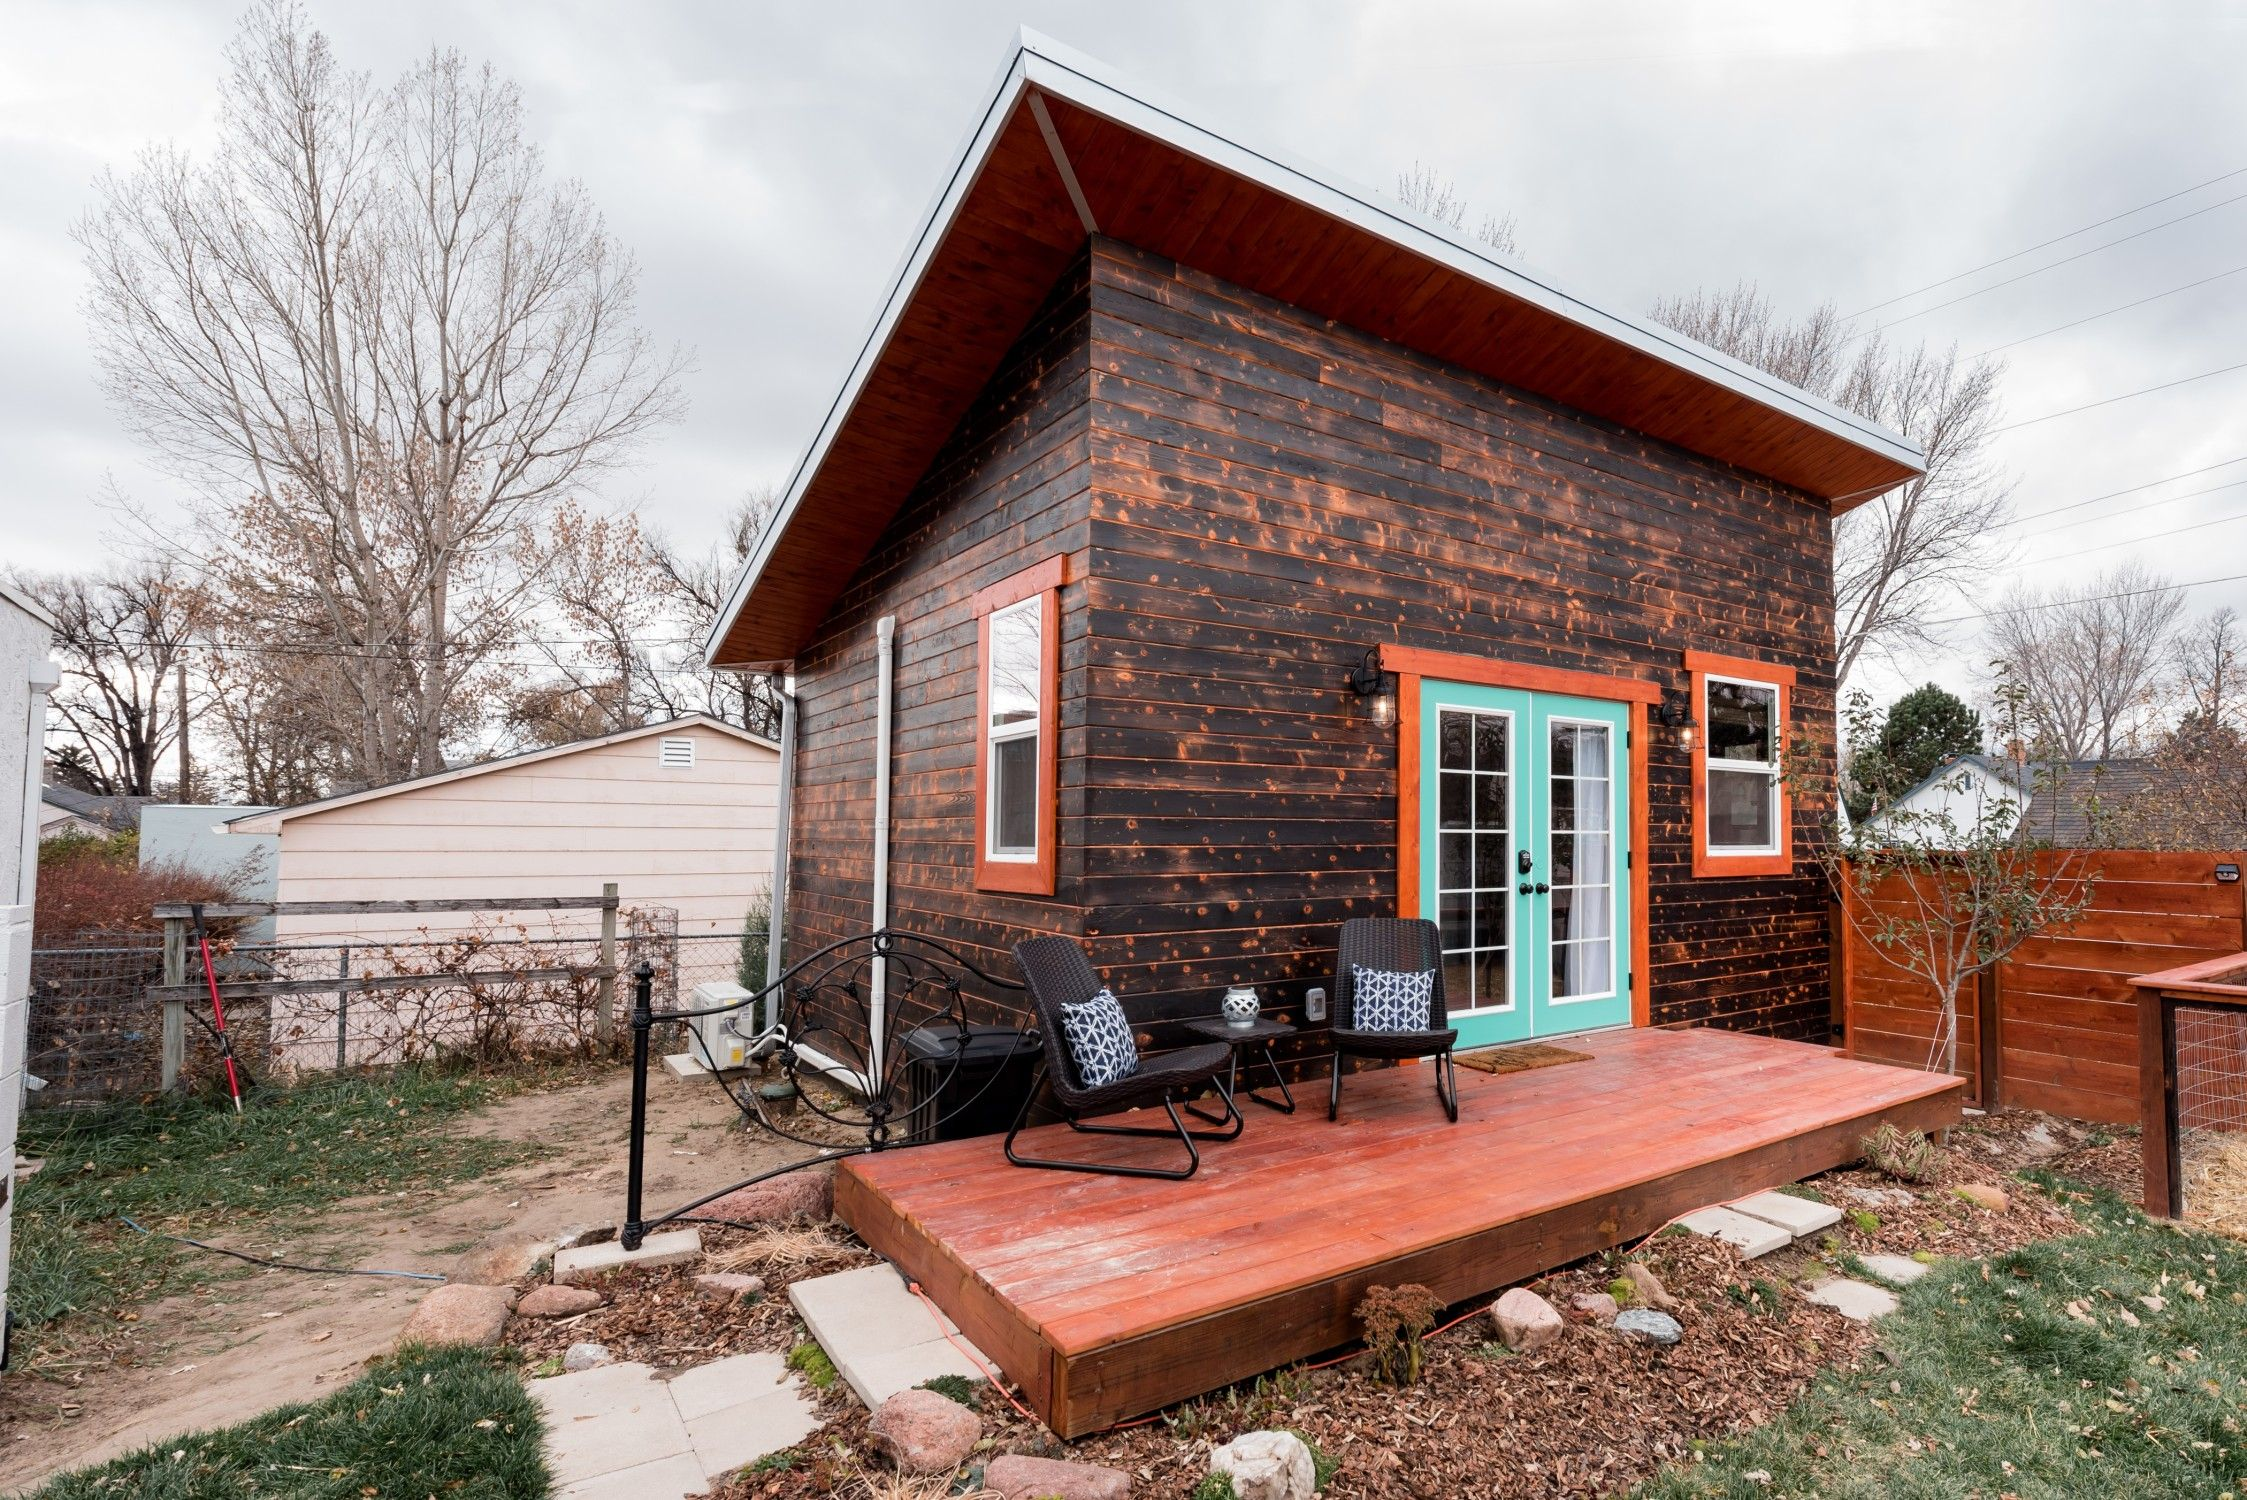 Pin On Tiny House Living